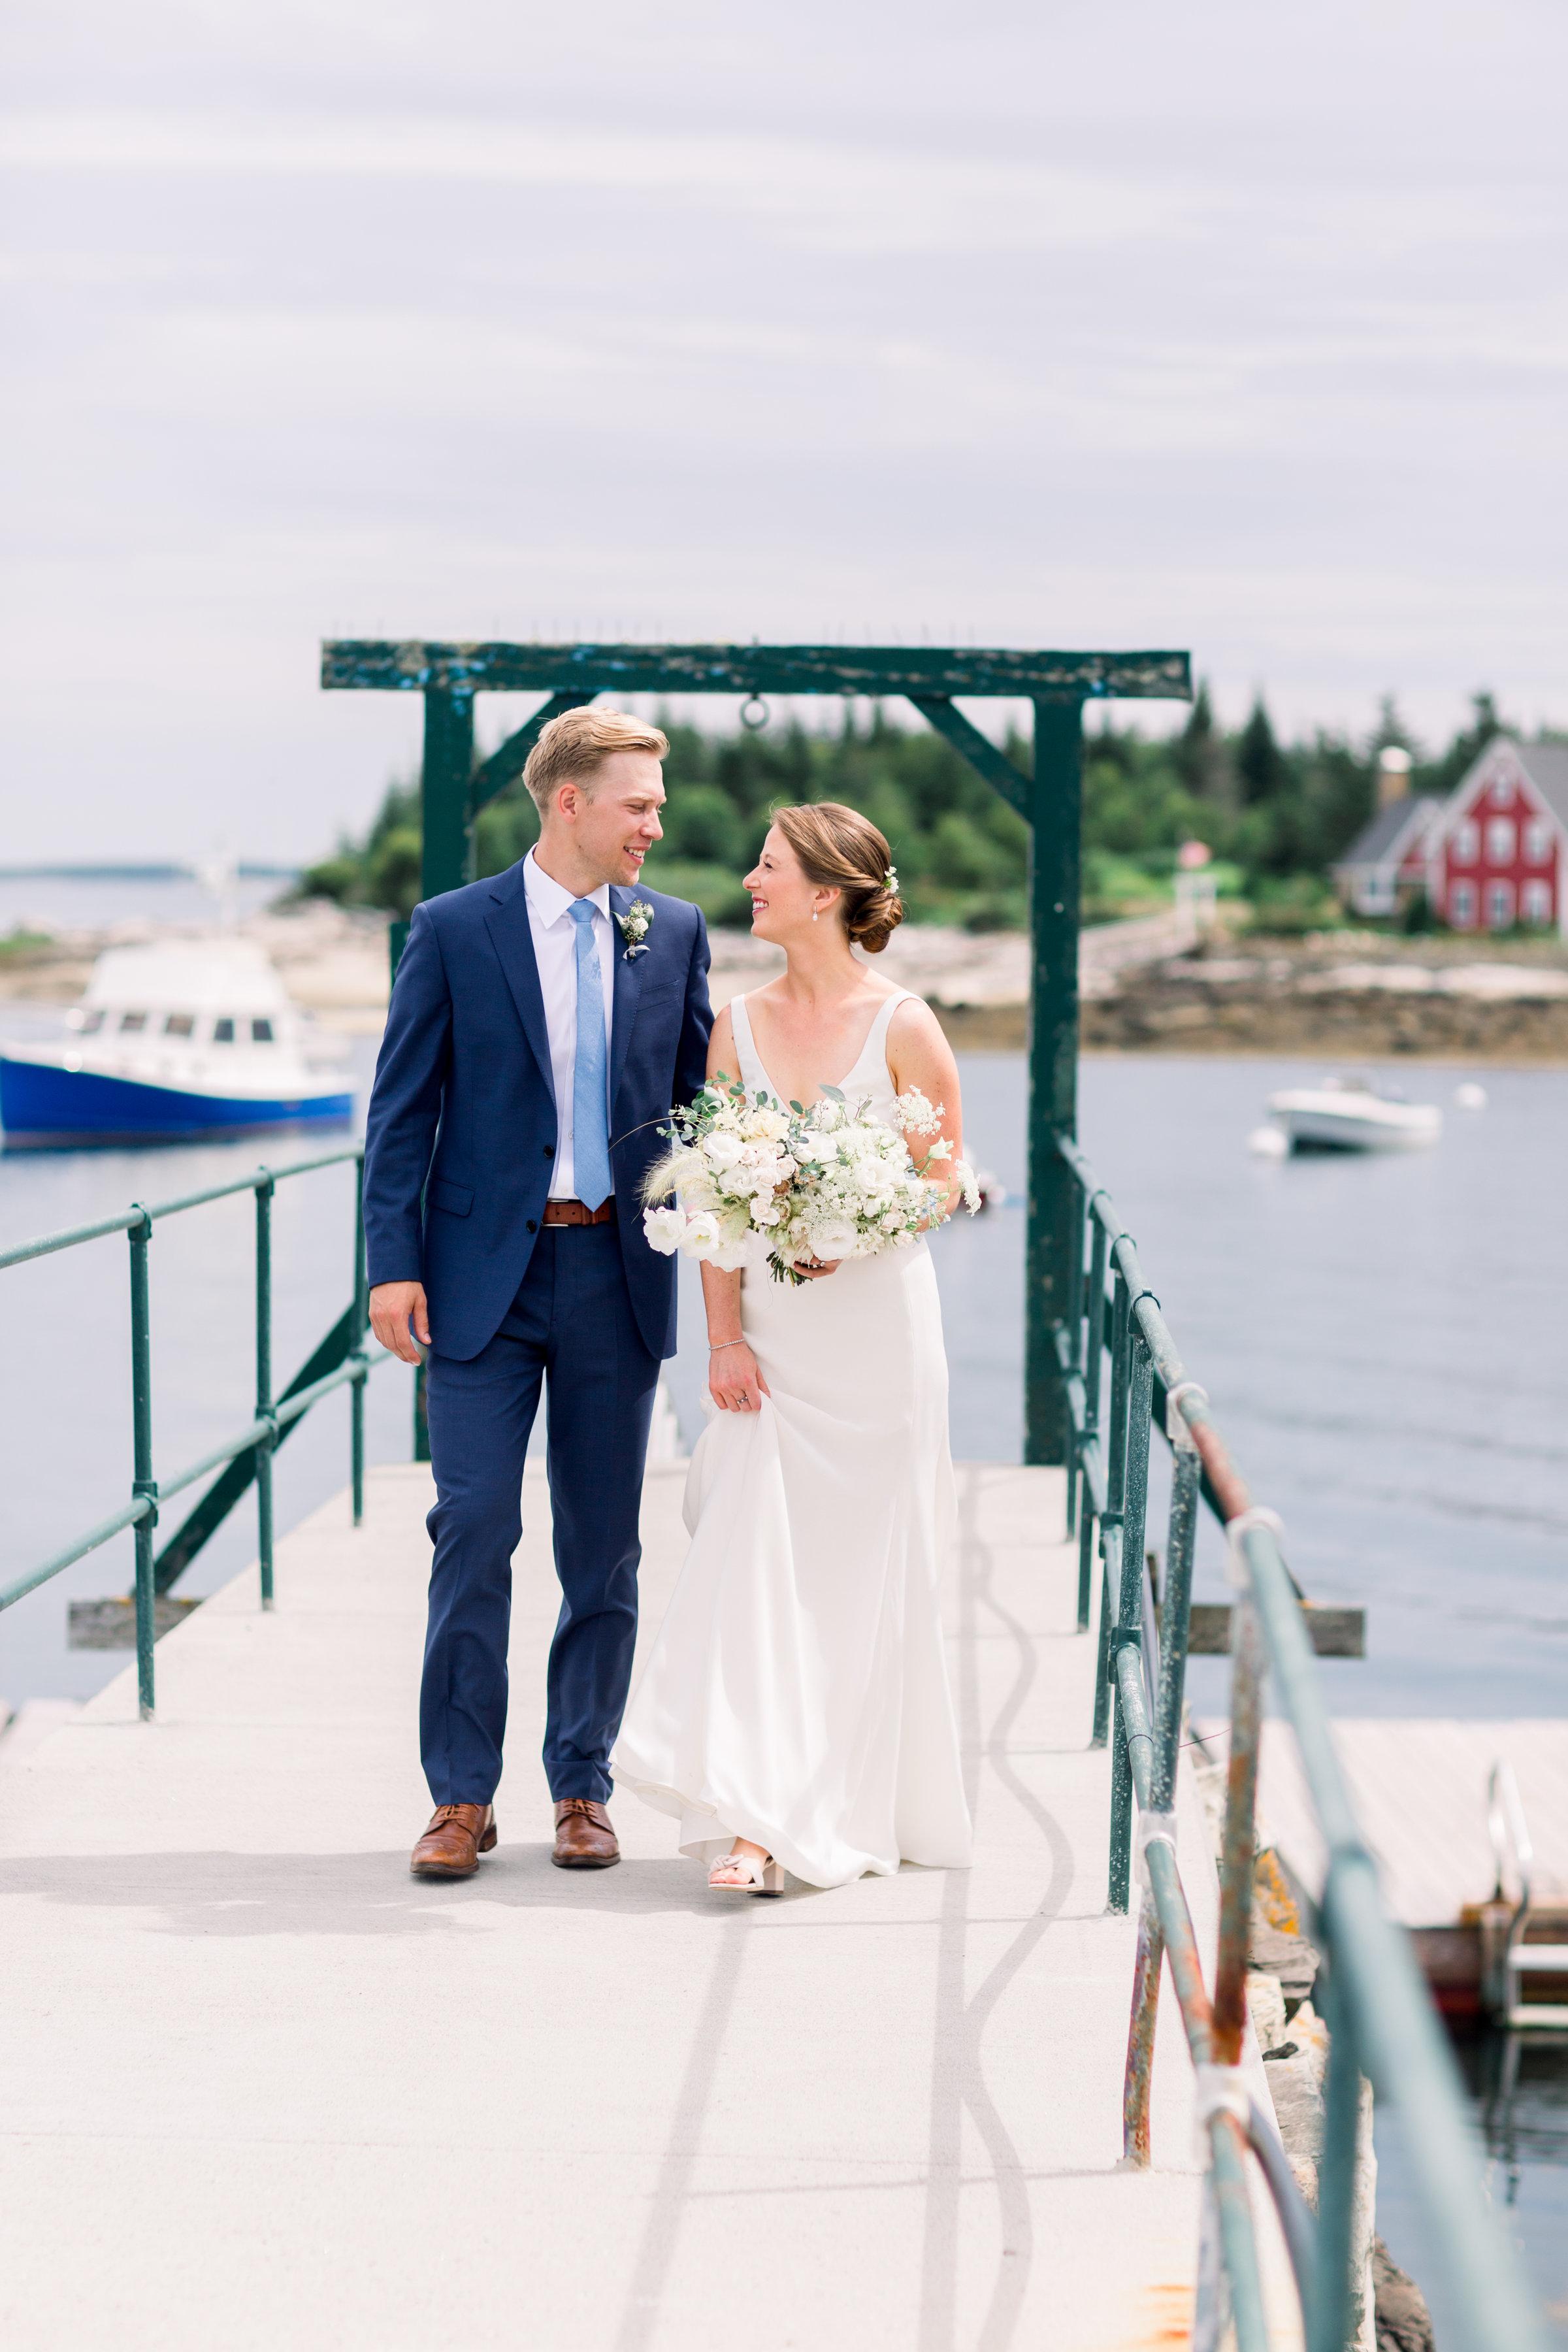 Watershed_Floral_Newagen_Wedding_Maine_5933.jpg